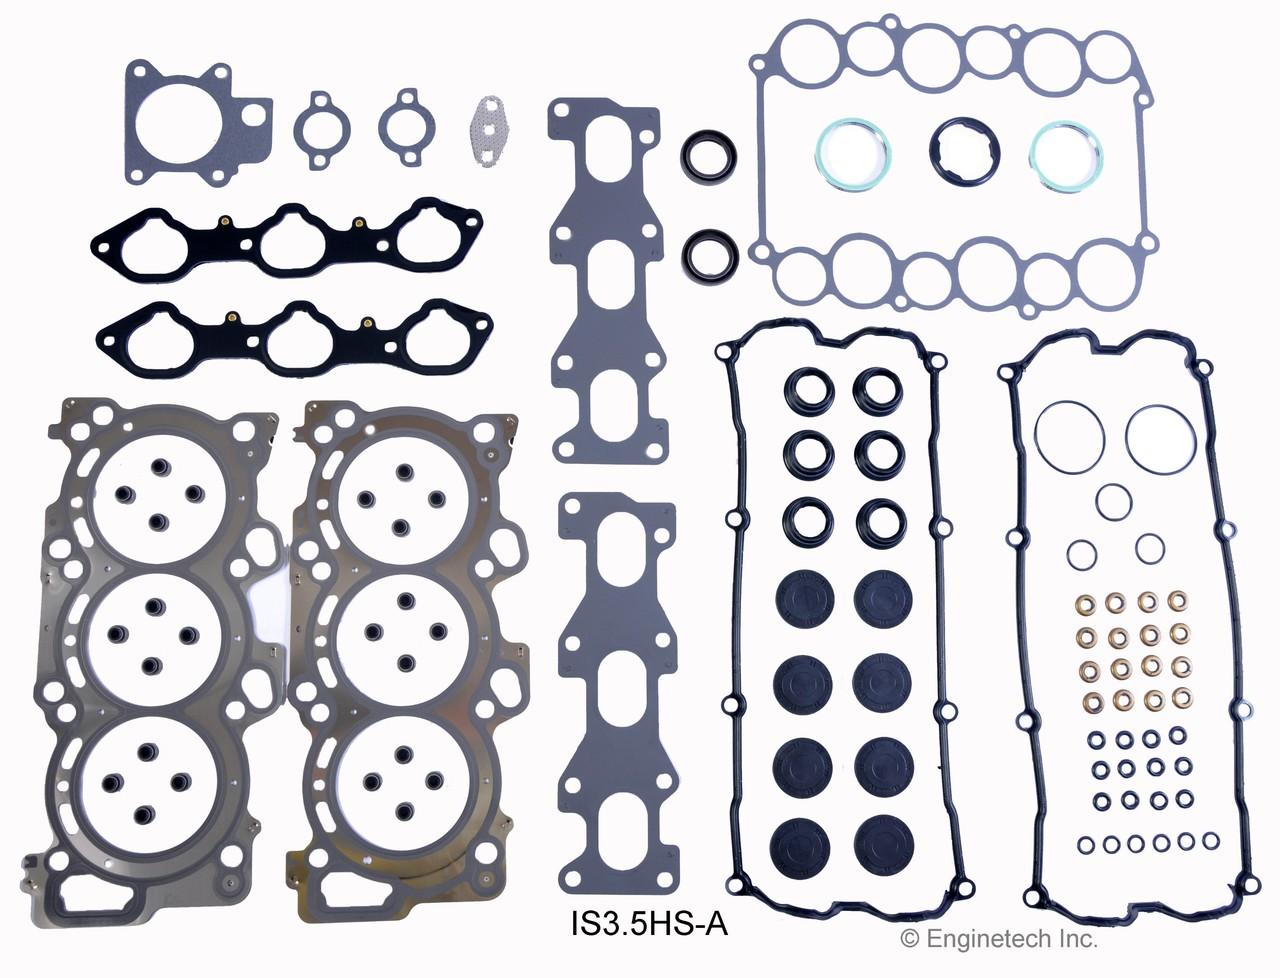 2002 Isuzu Rodeo 3 2L Engine Remain Kit (Re-Ring Kit) RMIS3